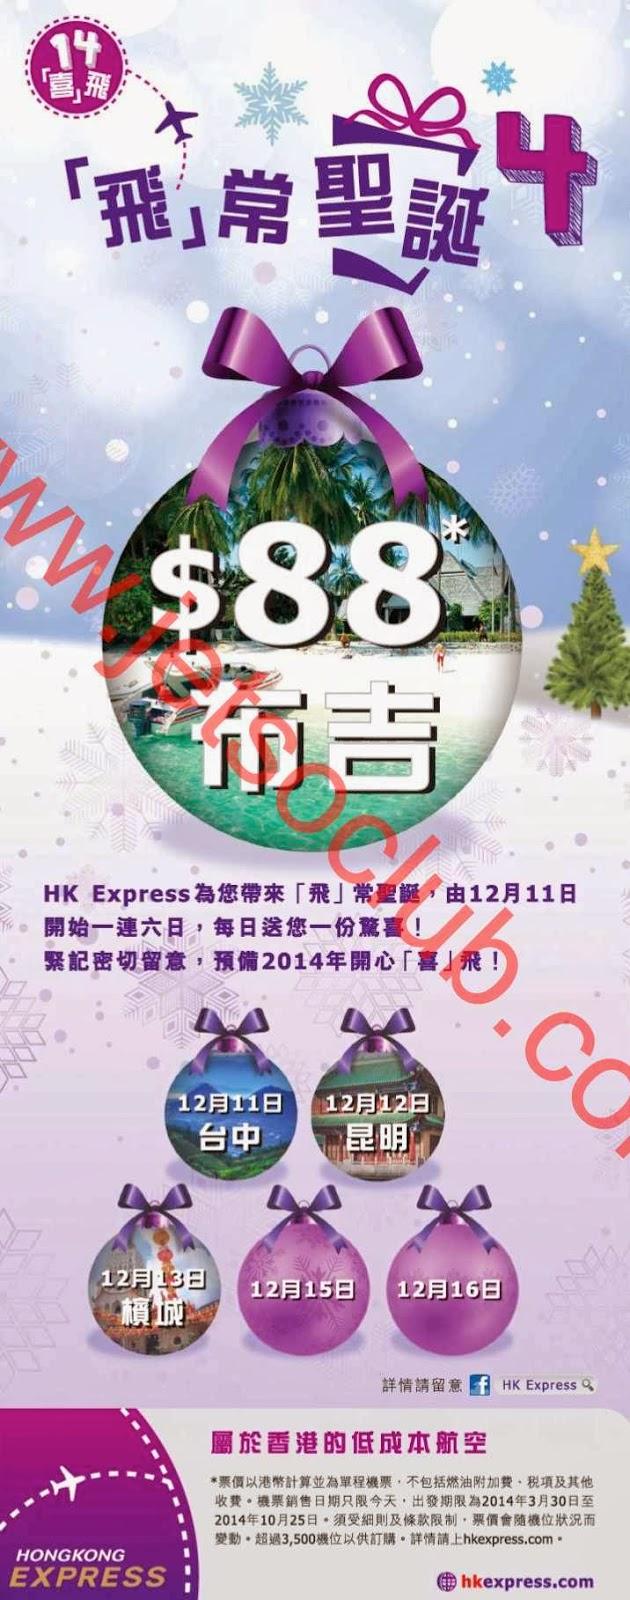 HK Express:布吉單程機票 $88(訂購:14/12) ( Jetso Club 著數俱樂部 )